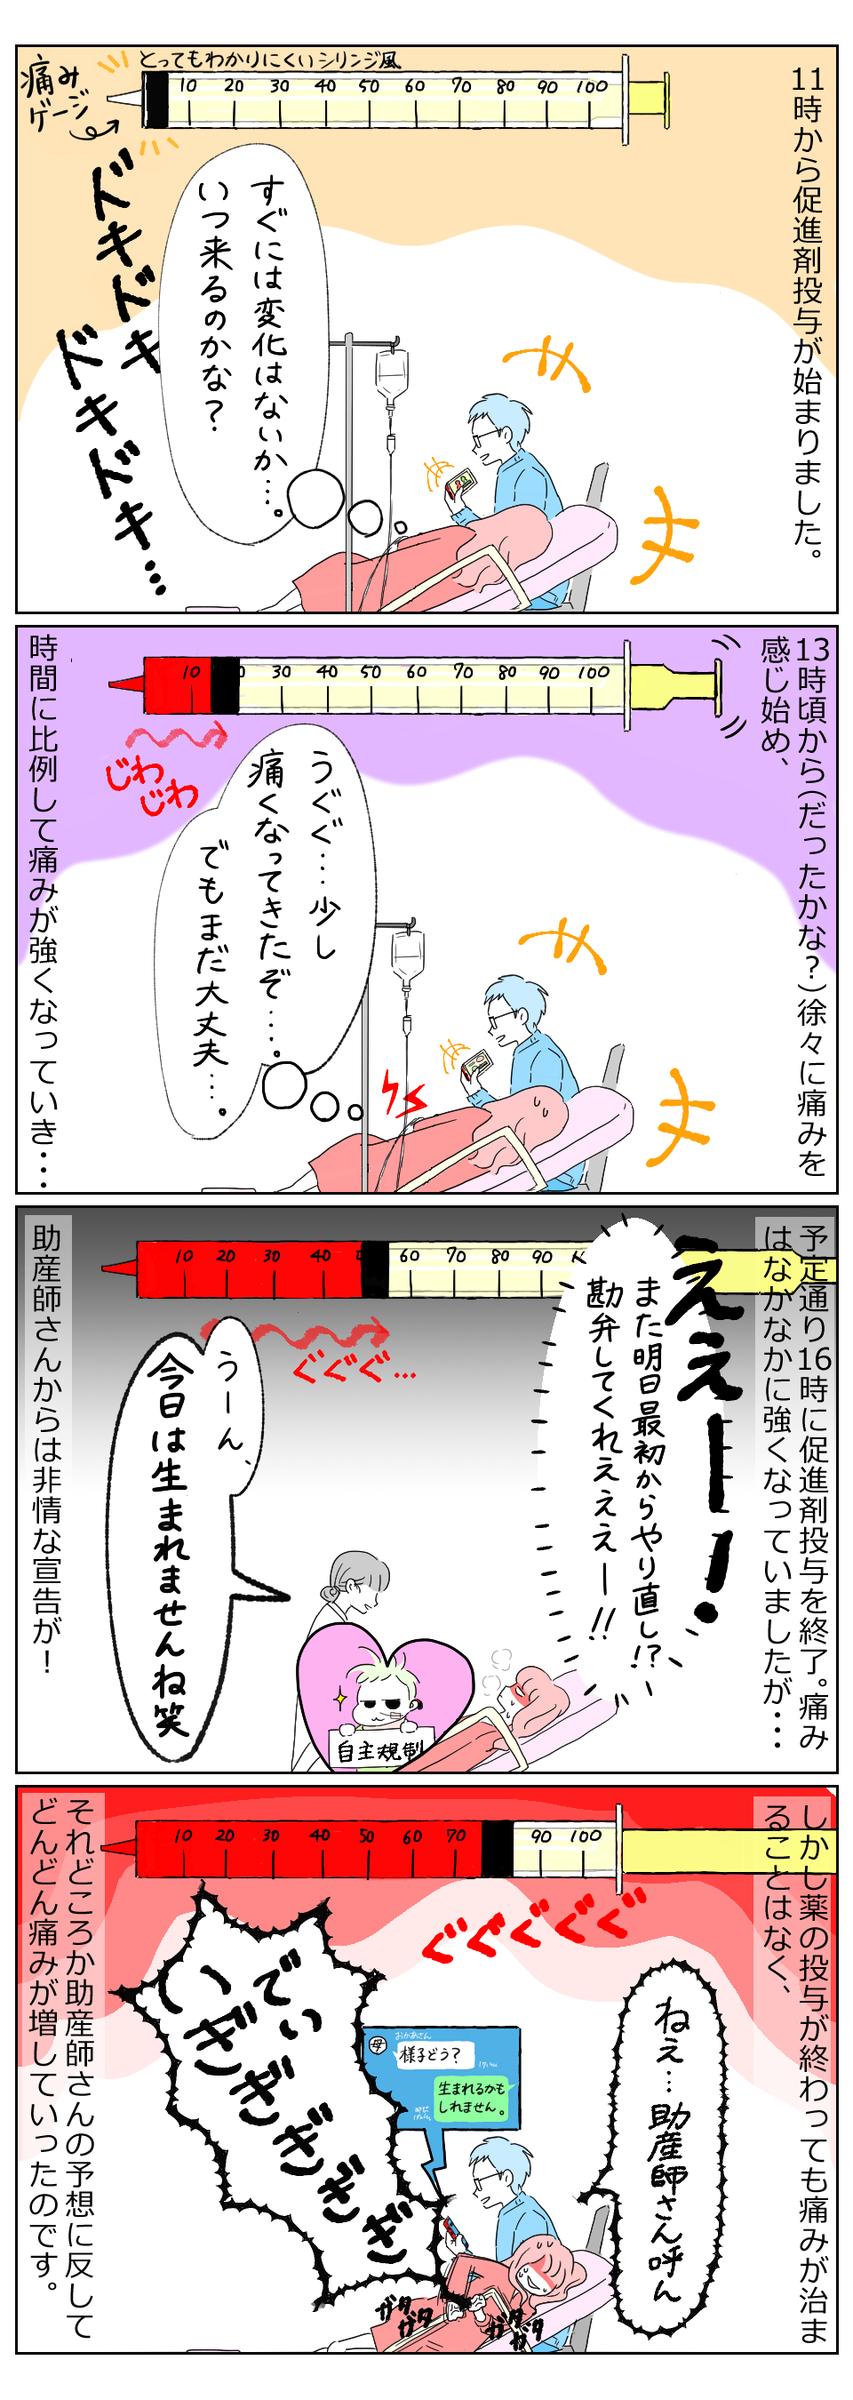 f:id:kayarimo:20190324210621j:plain